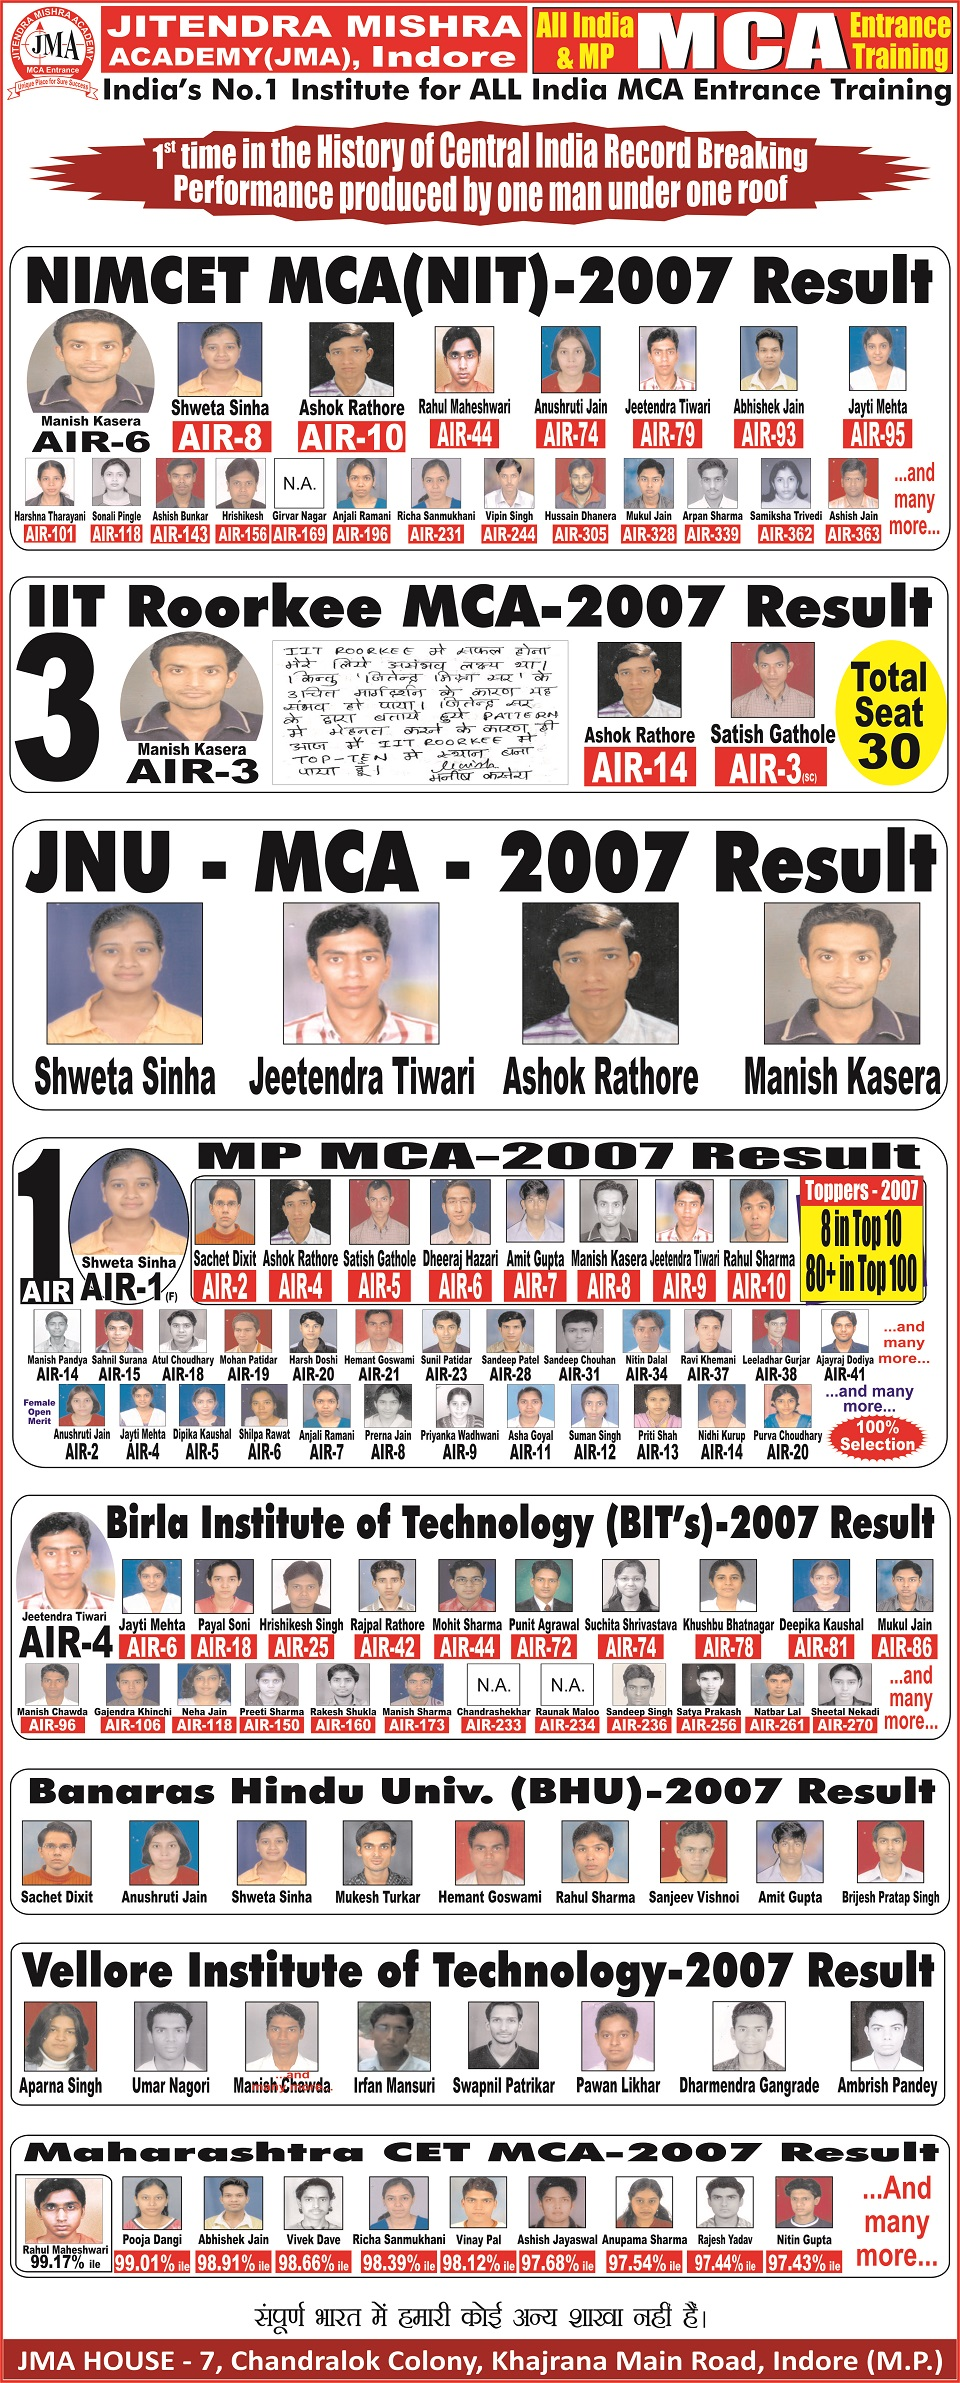 MCA 2007 Results